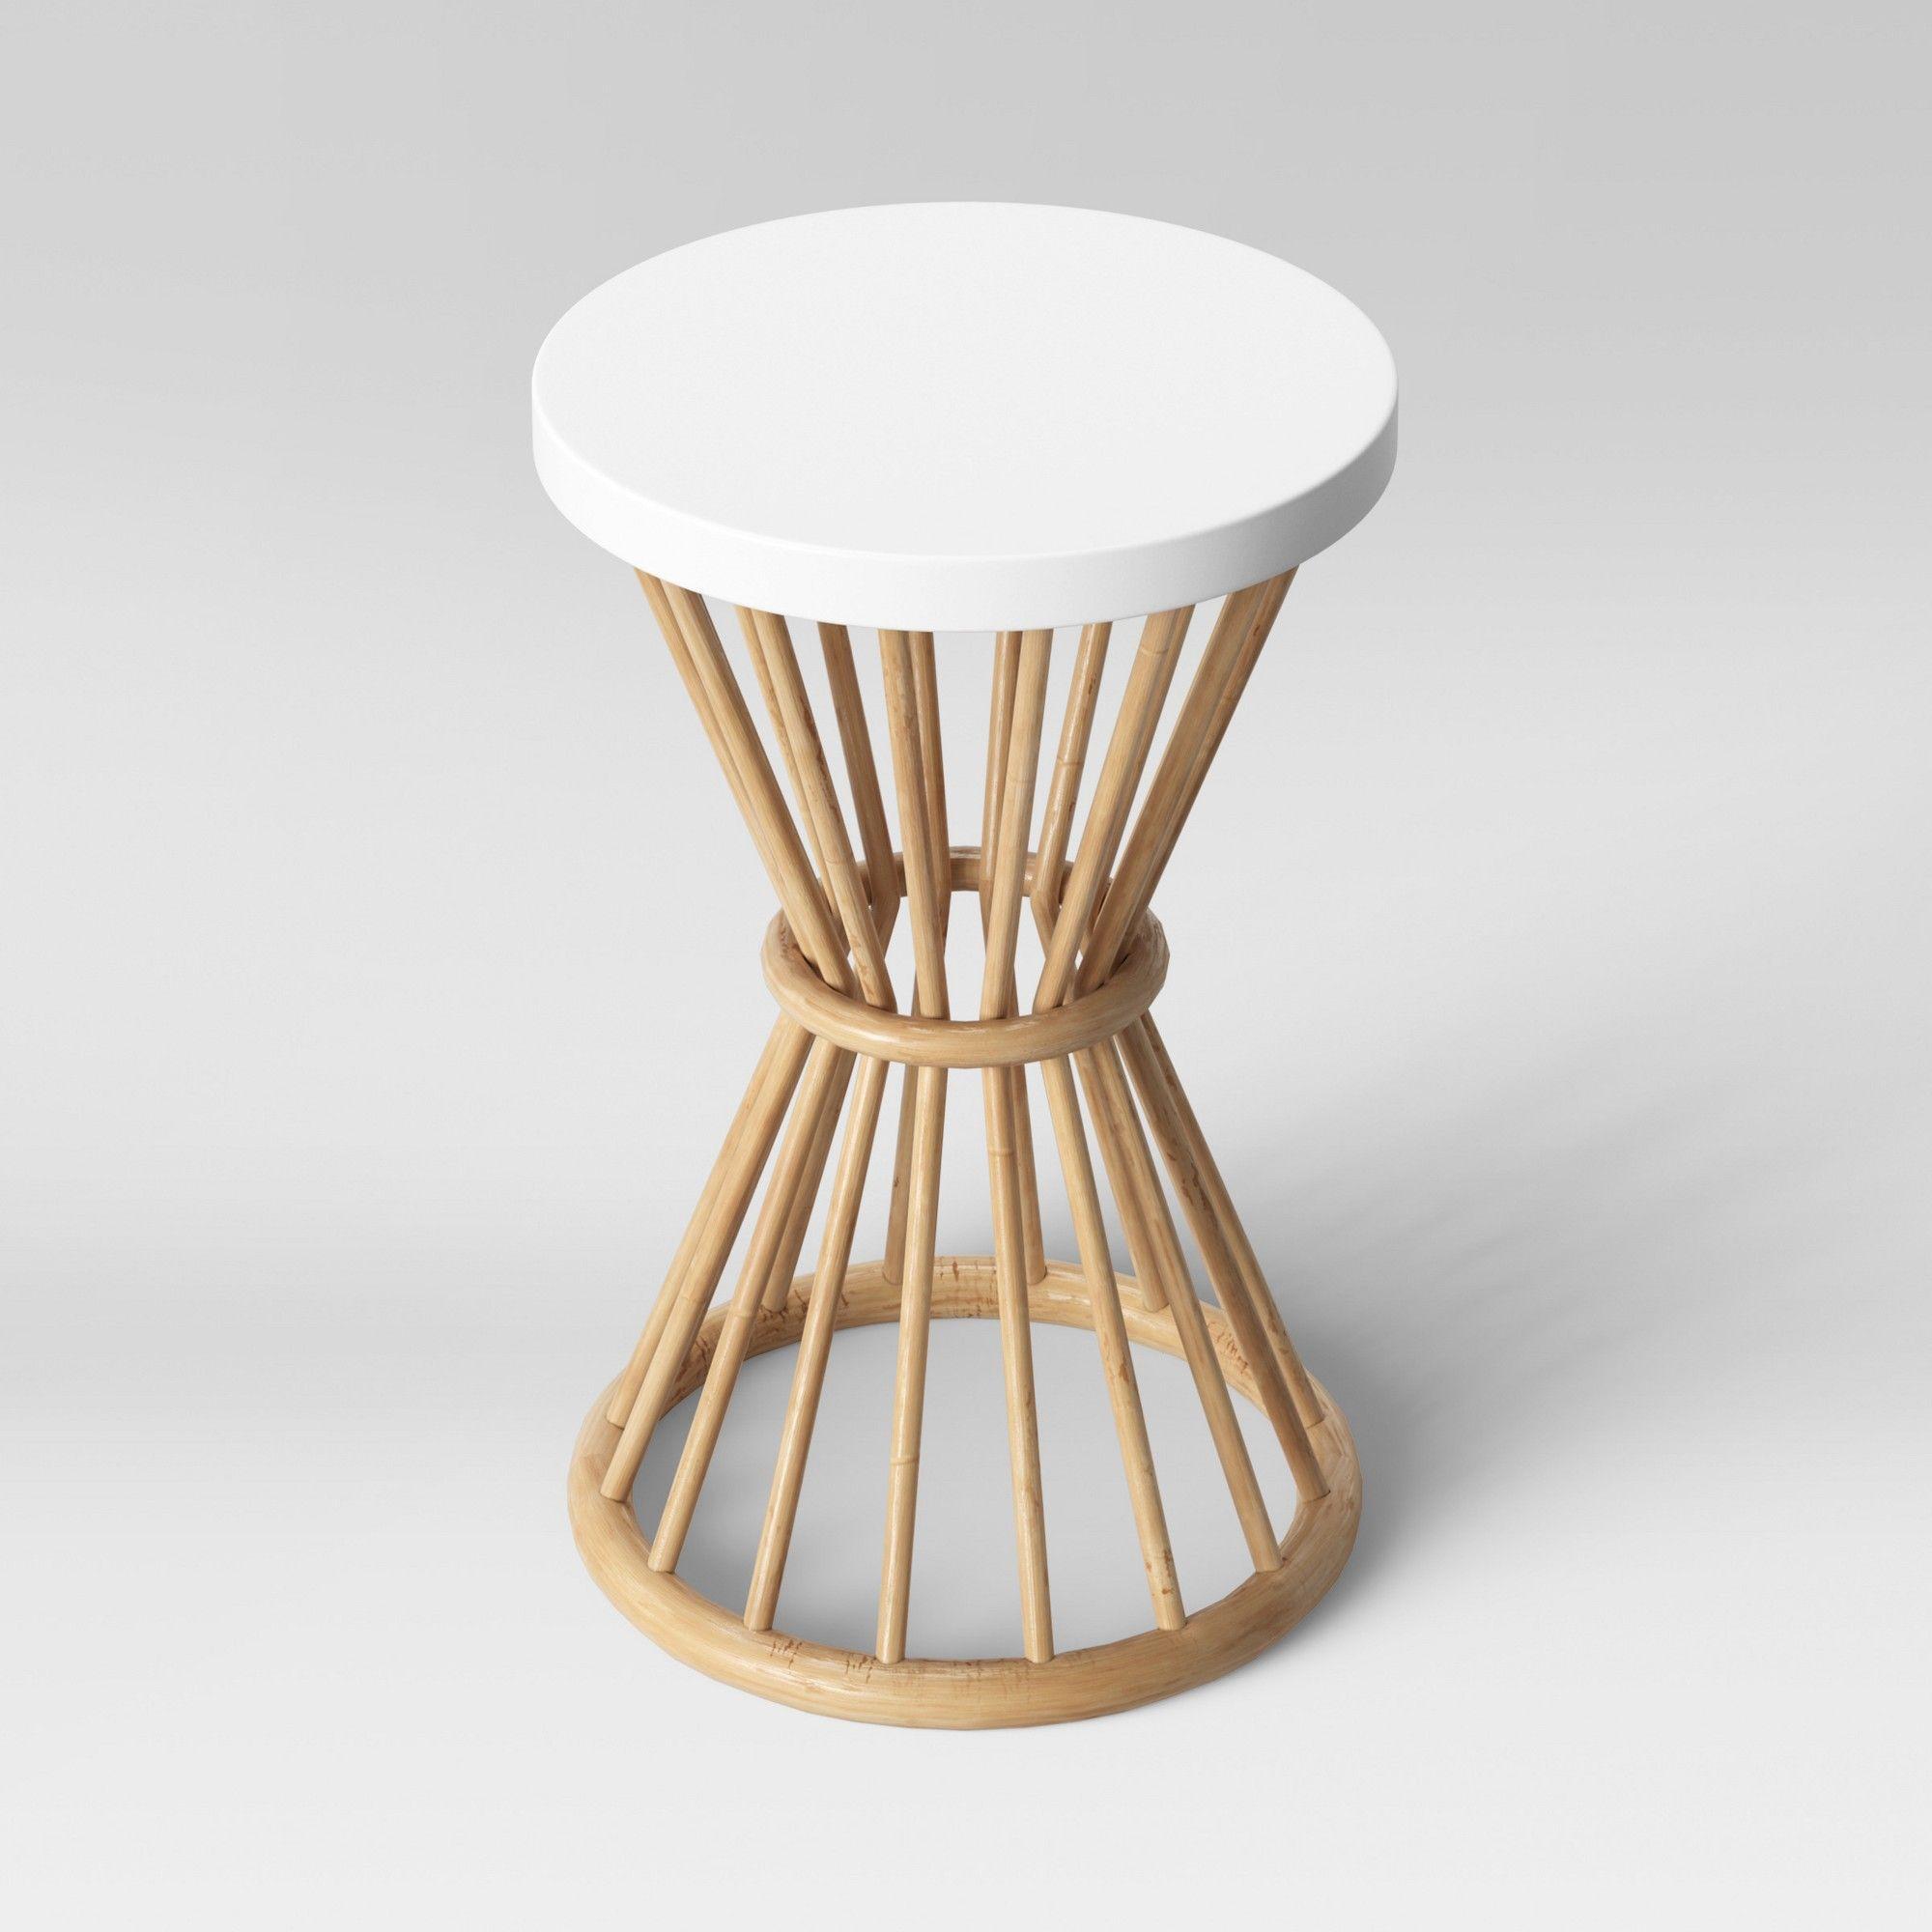 Aloysia Rattan End Table White Opalhouse End Tables Opalhouse Target Home Decor [ 2000 x 2000 Pixel ]